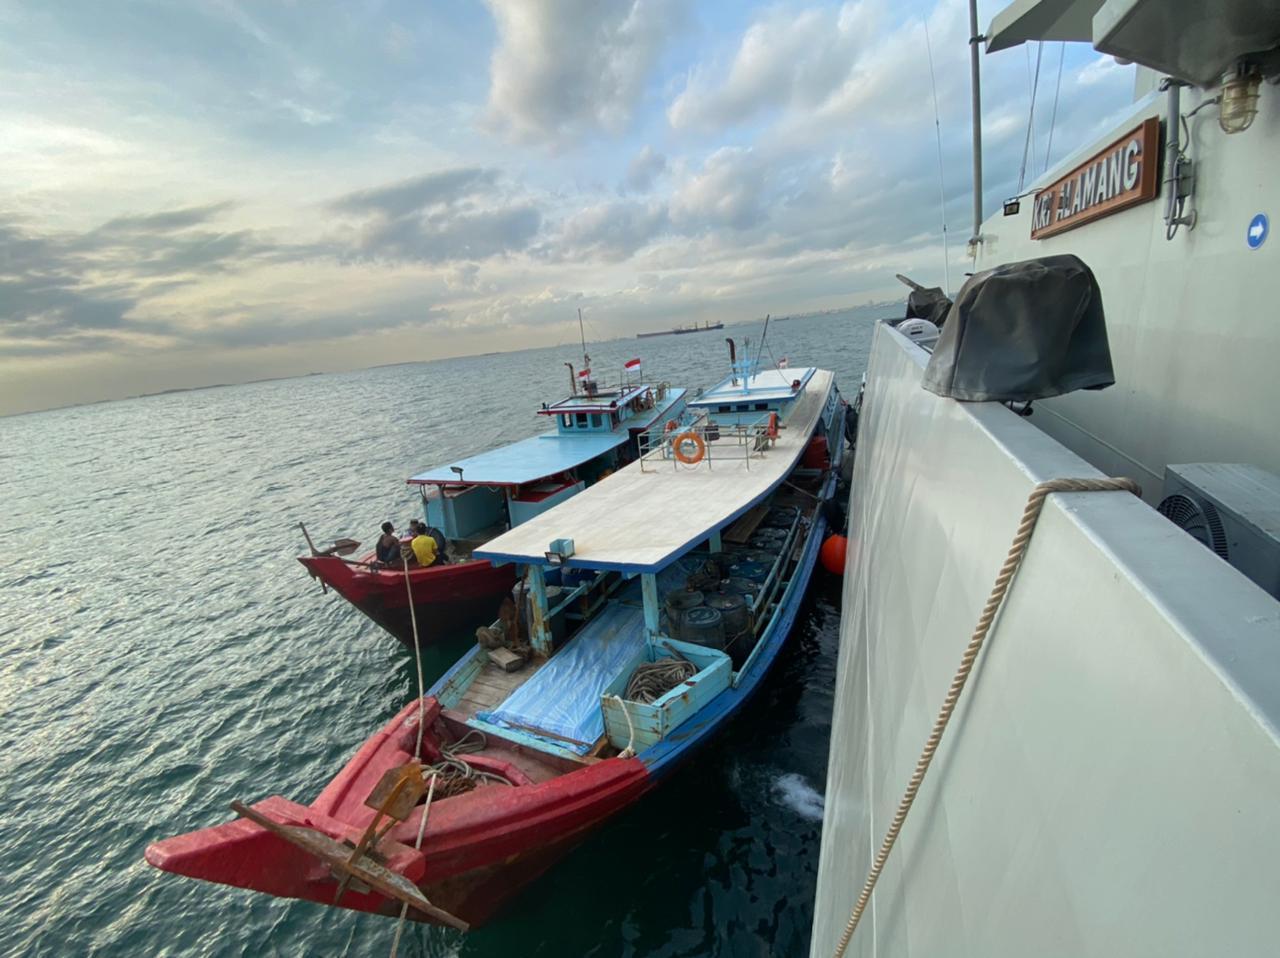 TNI AL Gagalkan 2 Kapal Minyak Ilegal di Selat Singapura. Foto: puspentni